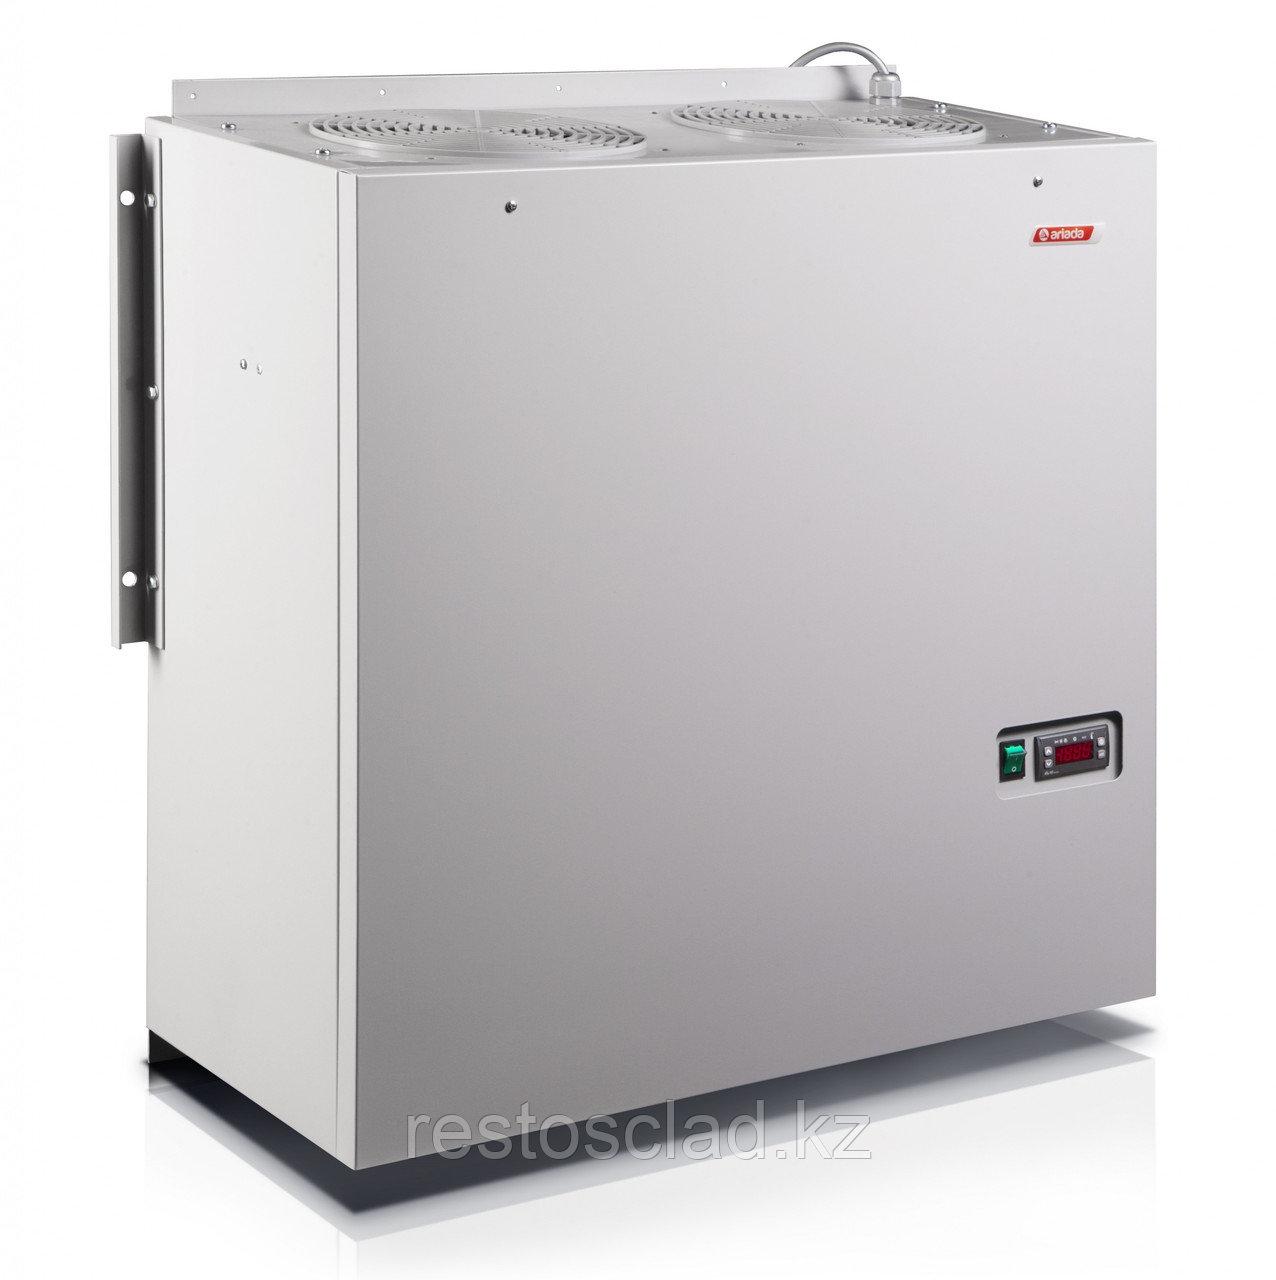 Сплит-система АРИАДА KMS-120